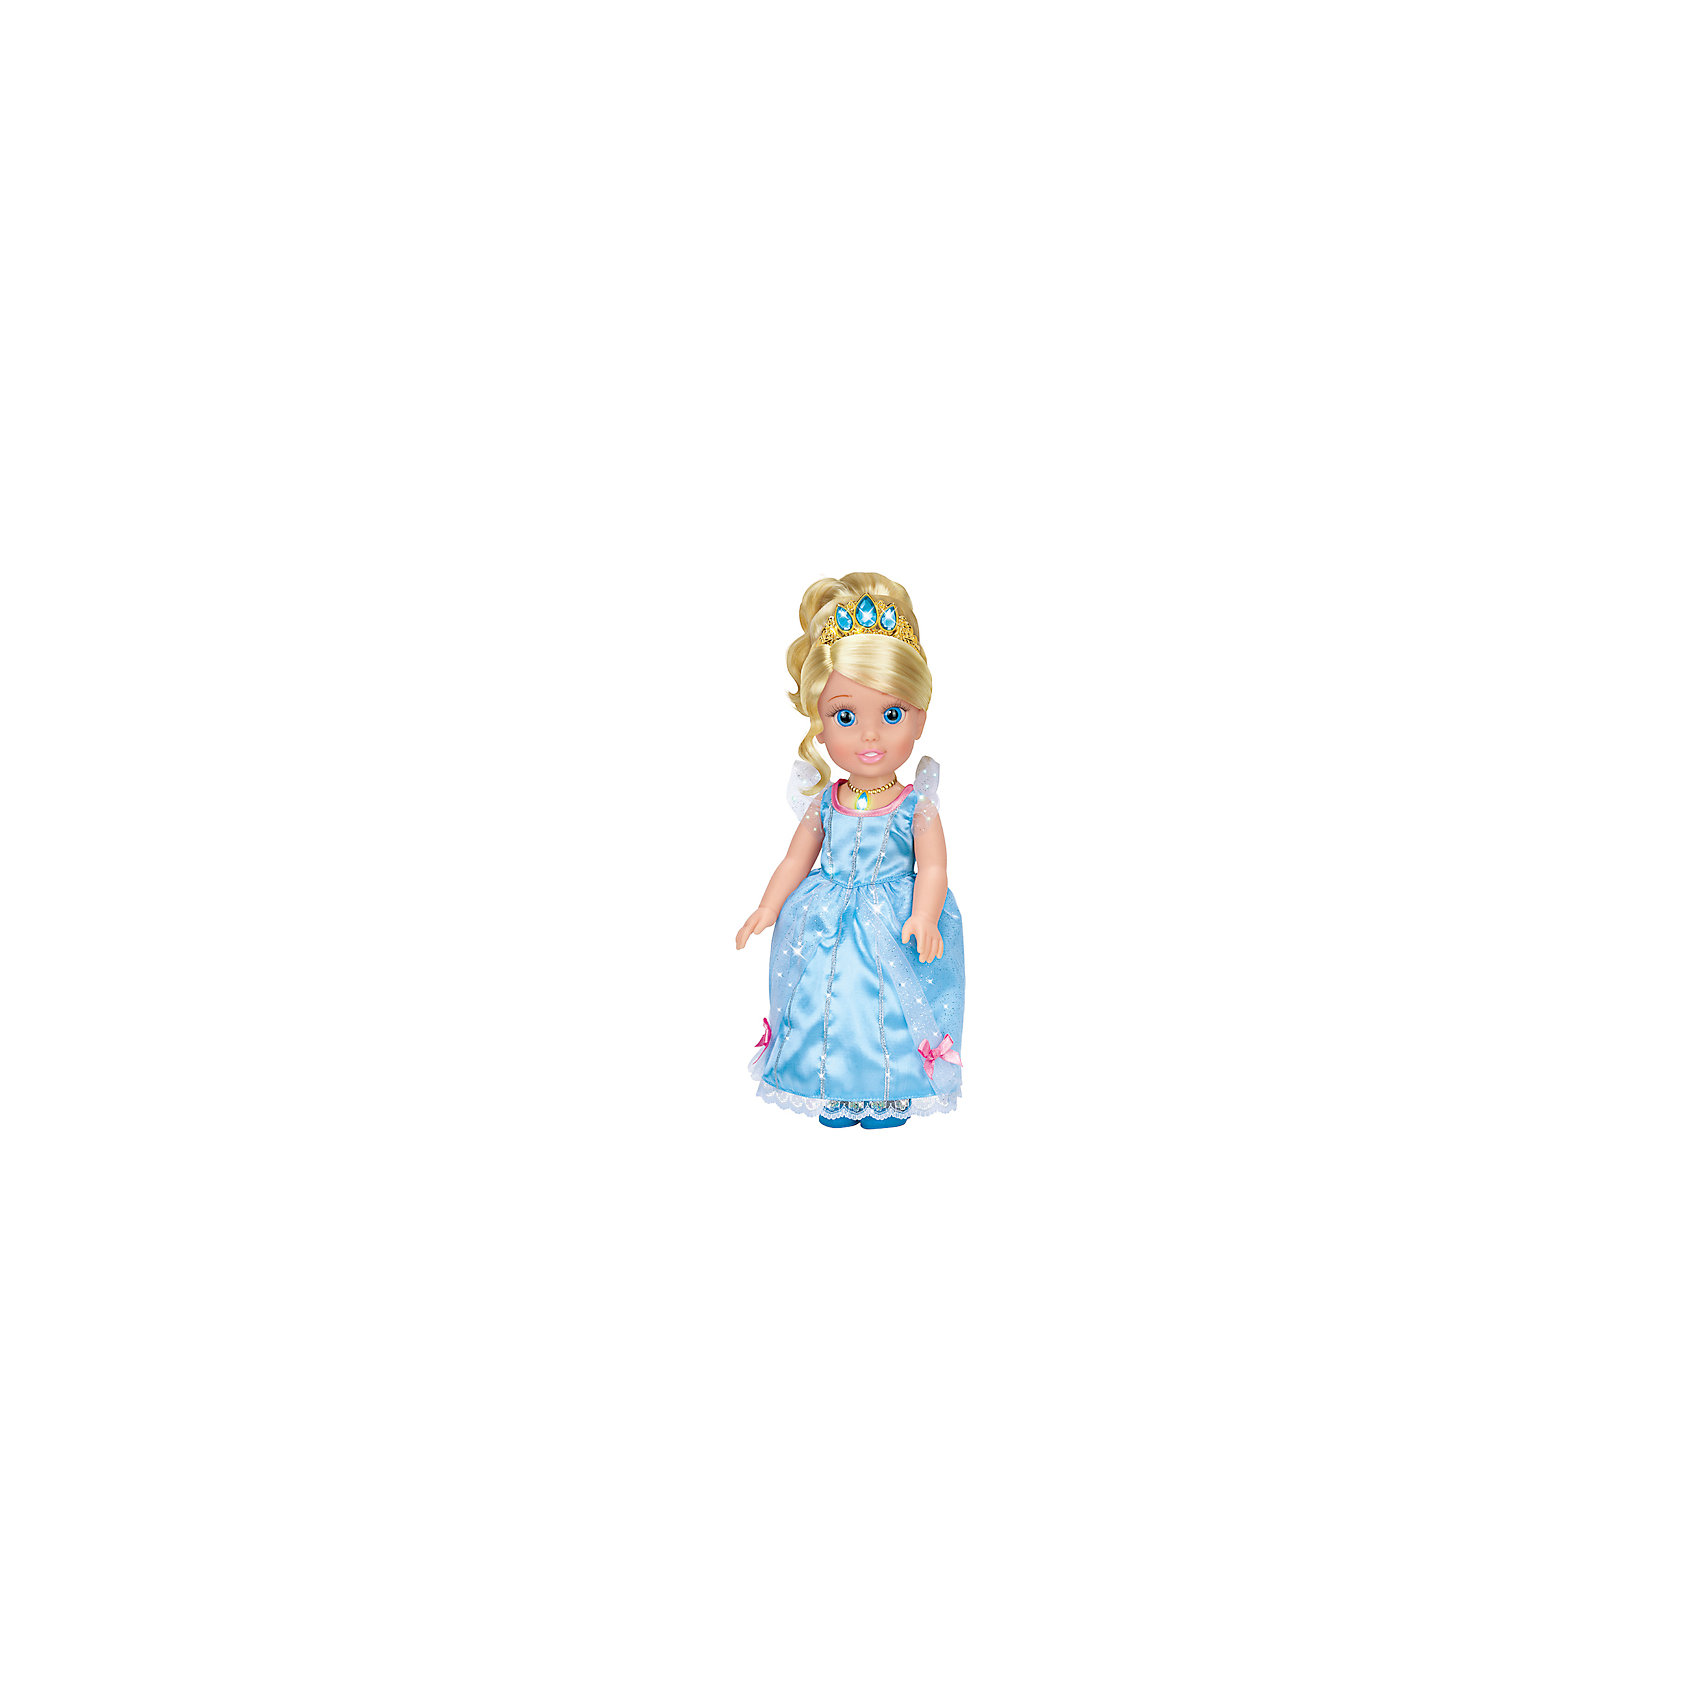 Карапуз Кукла Золушка со светящимся амулетом, 37 см, со звуком, Принцессы Дисней, Карапуз карапуз кукла золушка со светящимся амулетом 37 см со звуком принцессы дисней карапуз